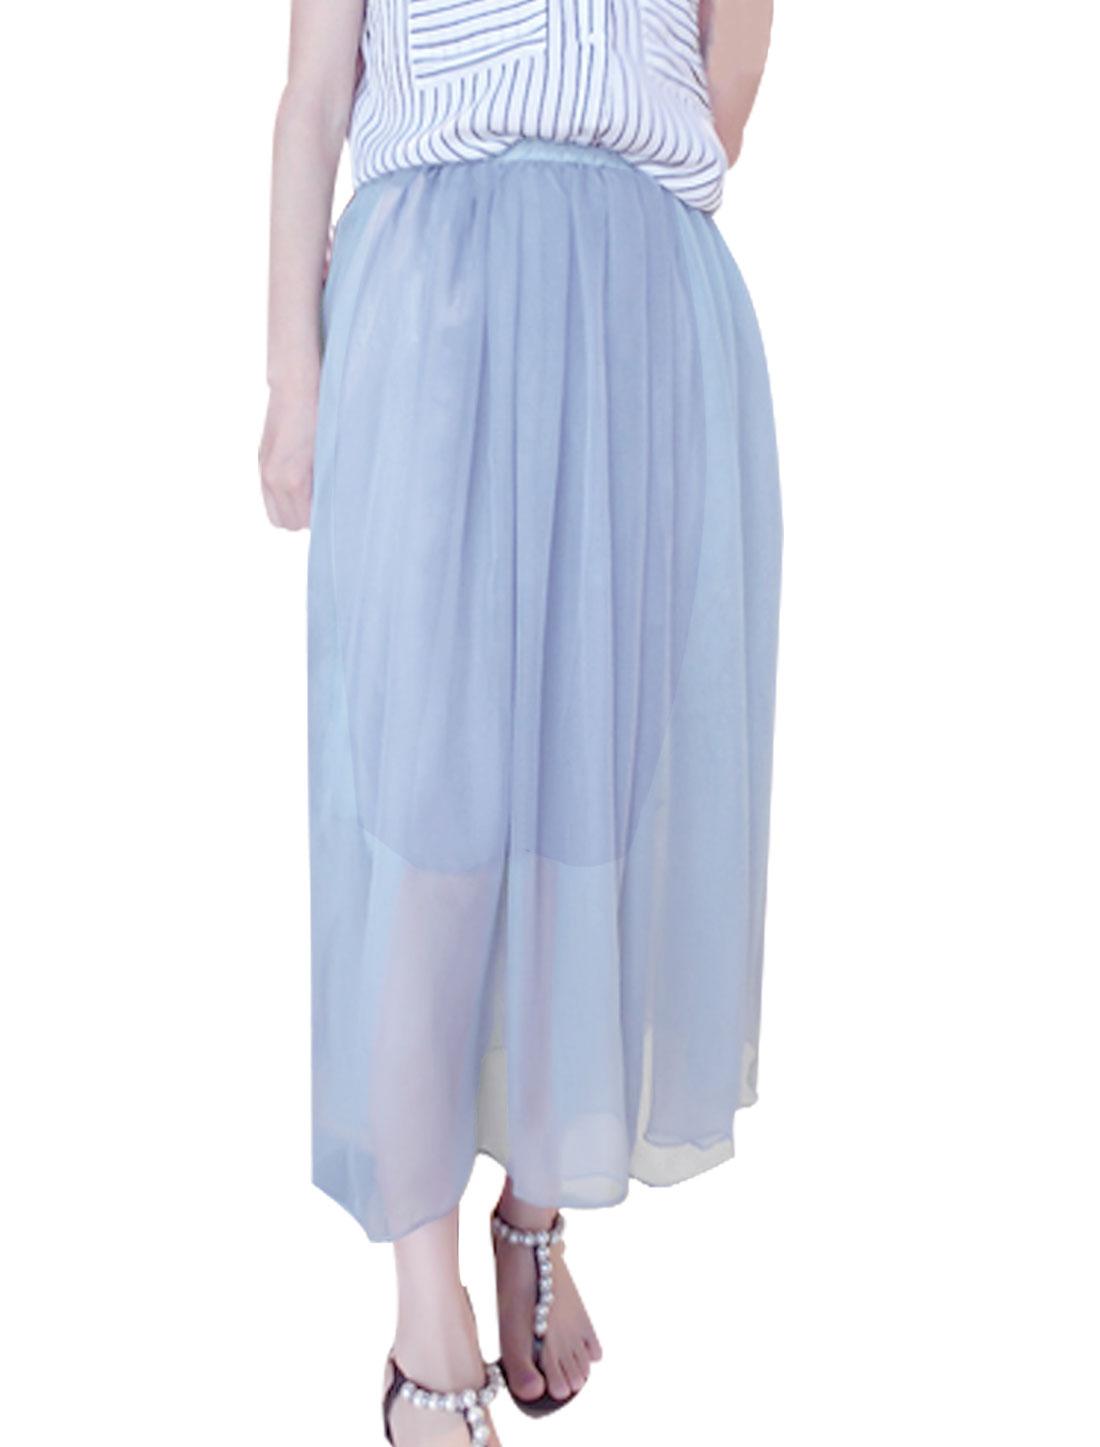 Woman's Elastic Waistband Polyester Lined Mesh Skirt Light Purple S